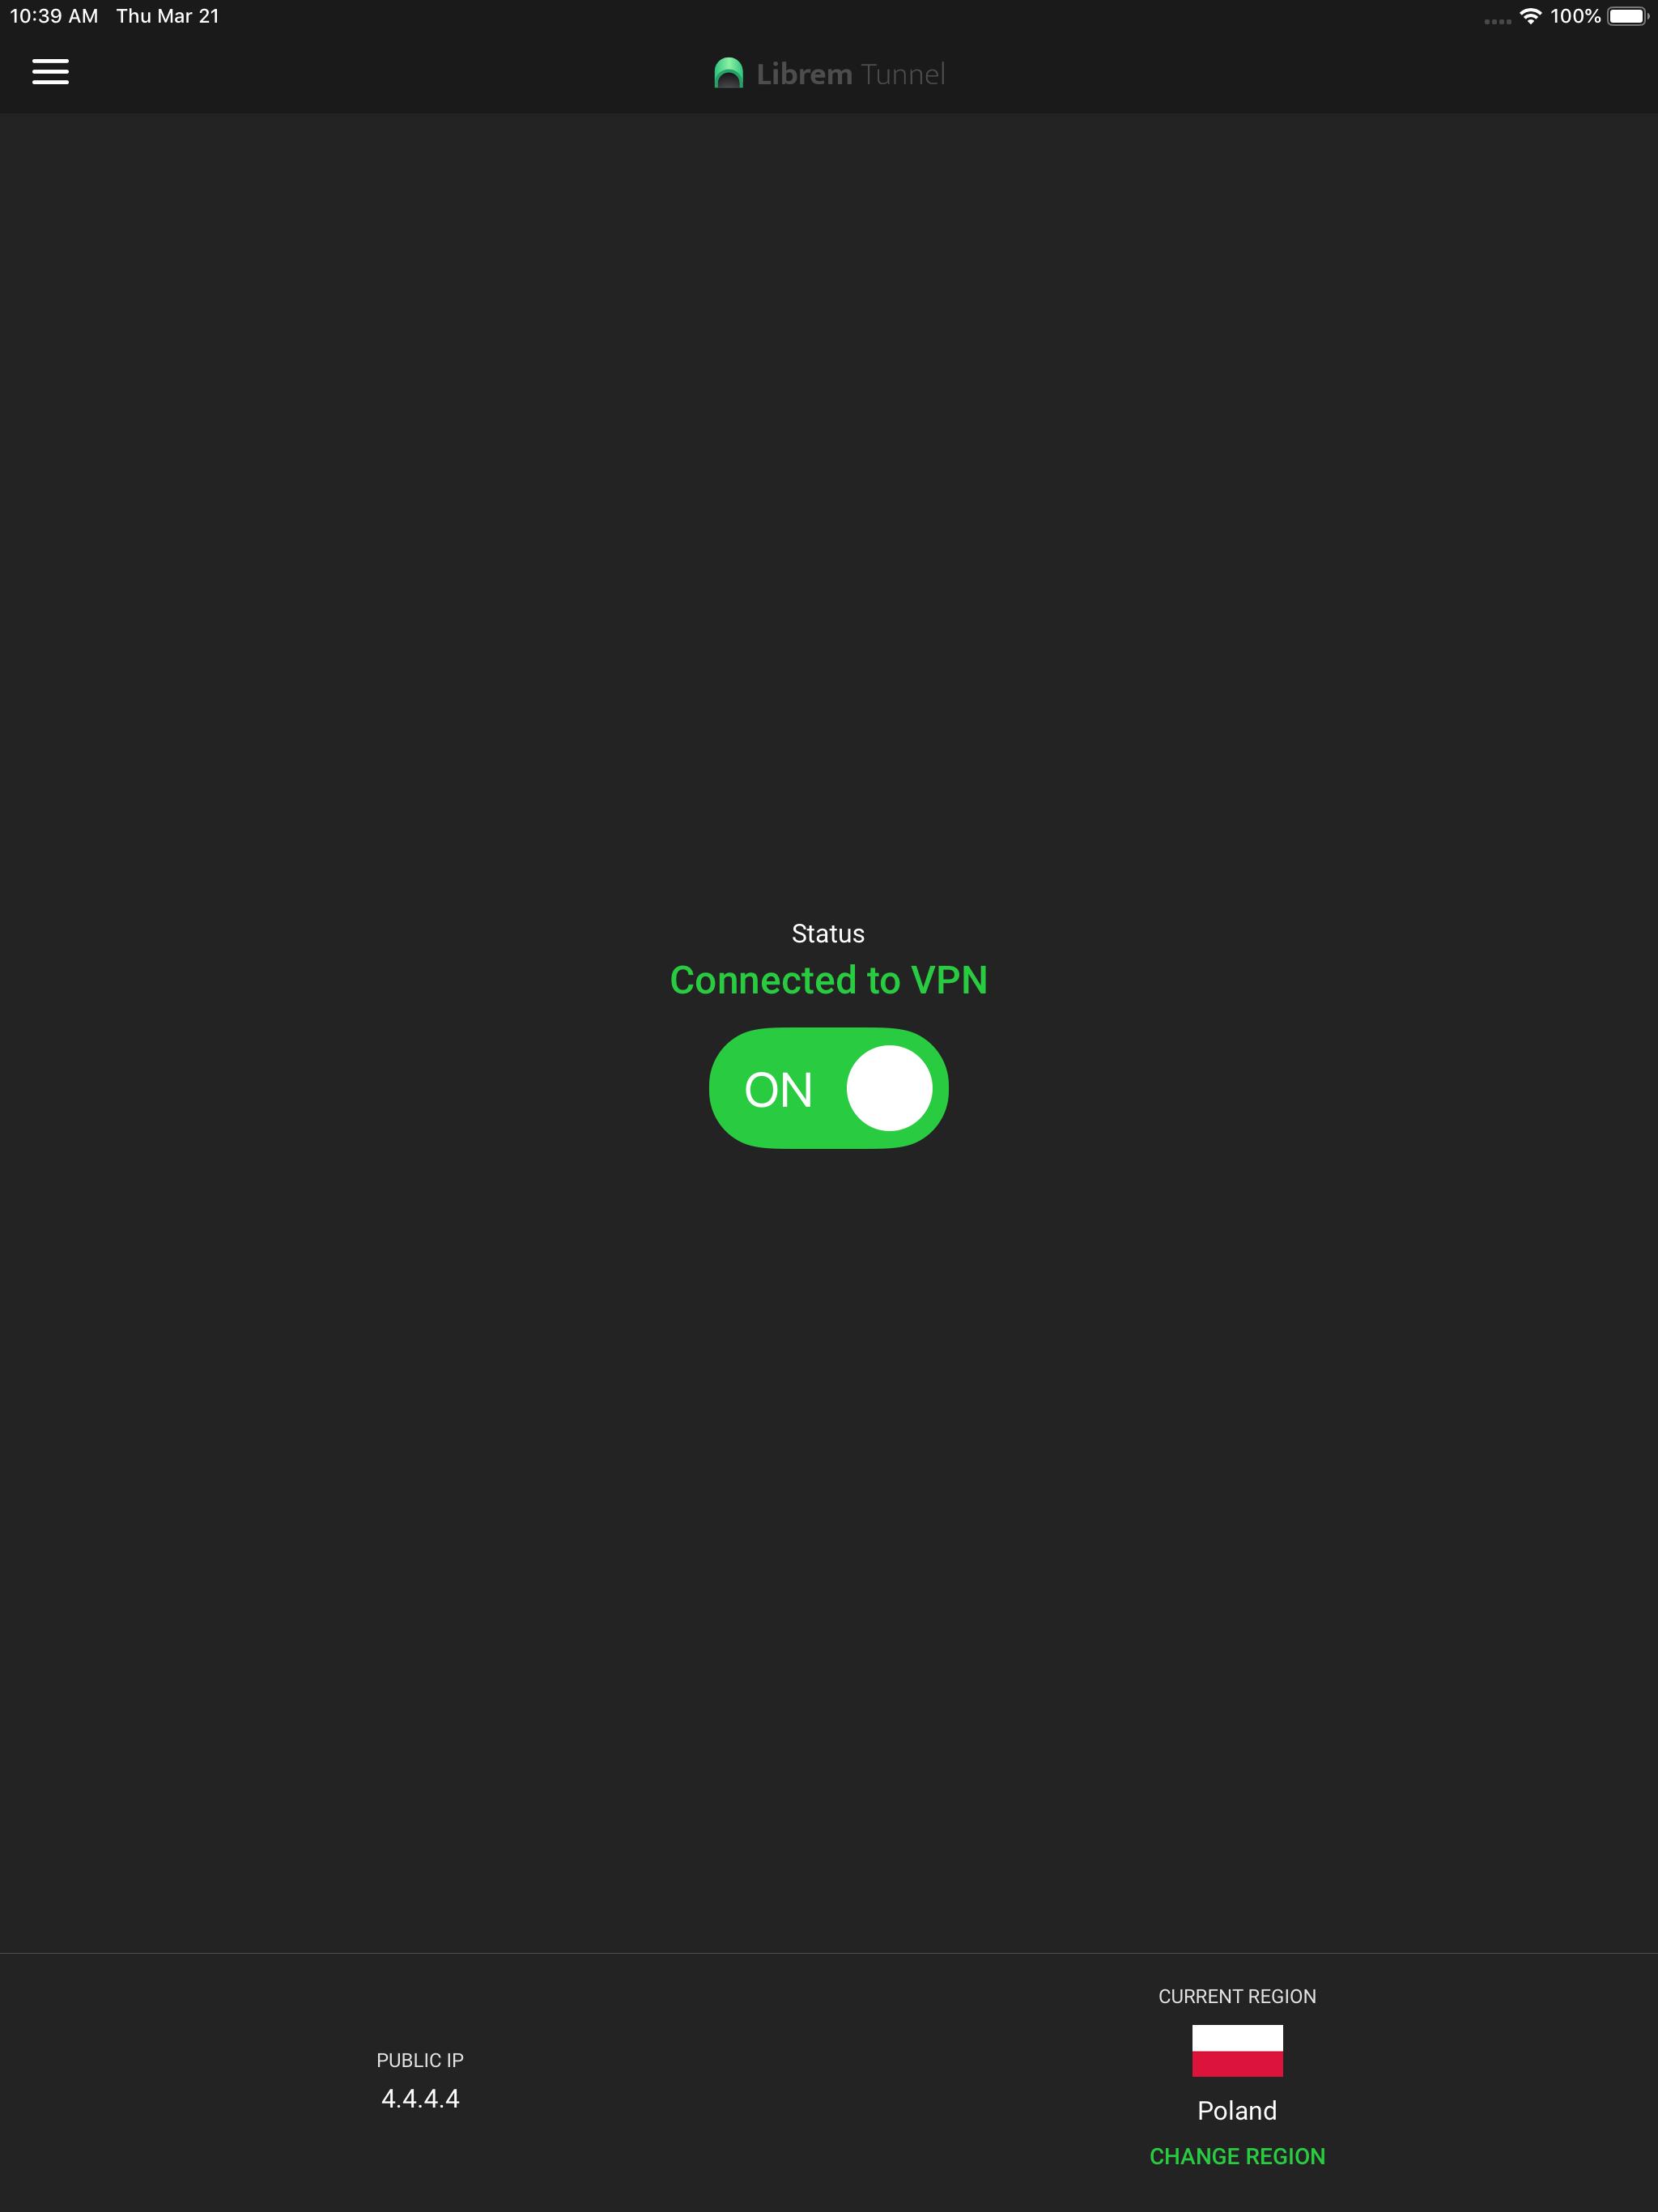 fastlane/screenshots/en-US/10_connected_iPad.png